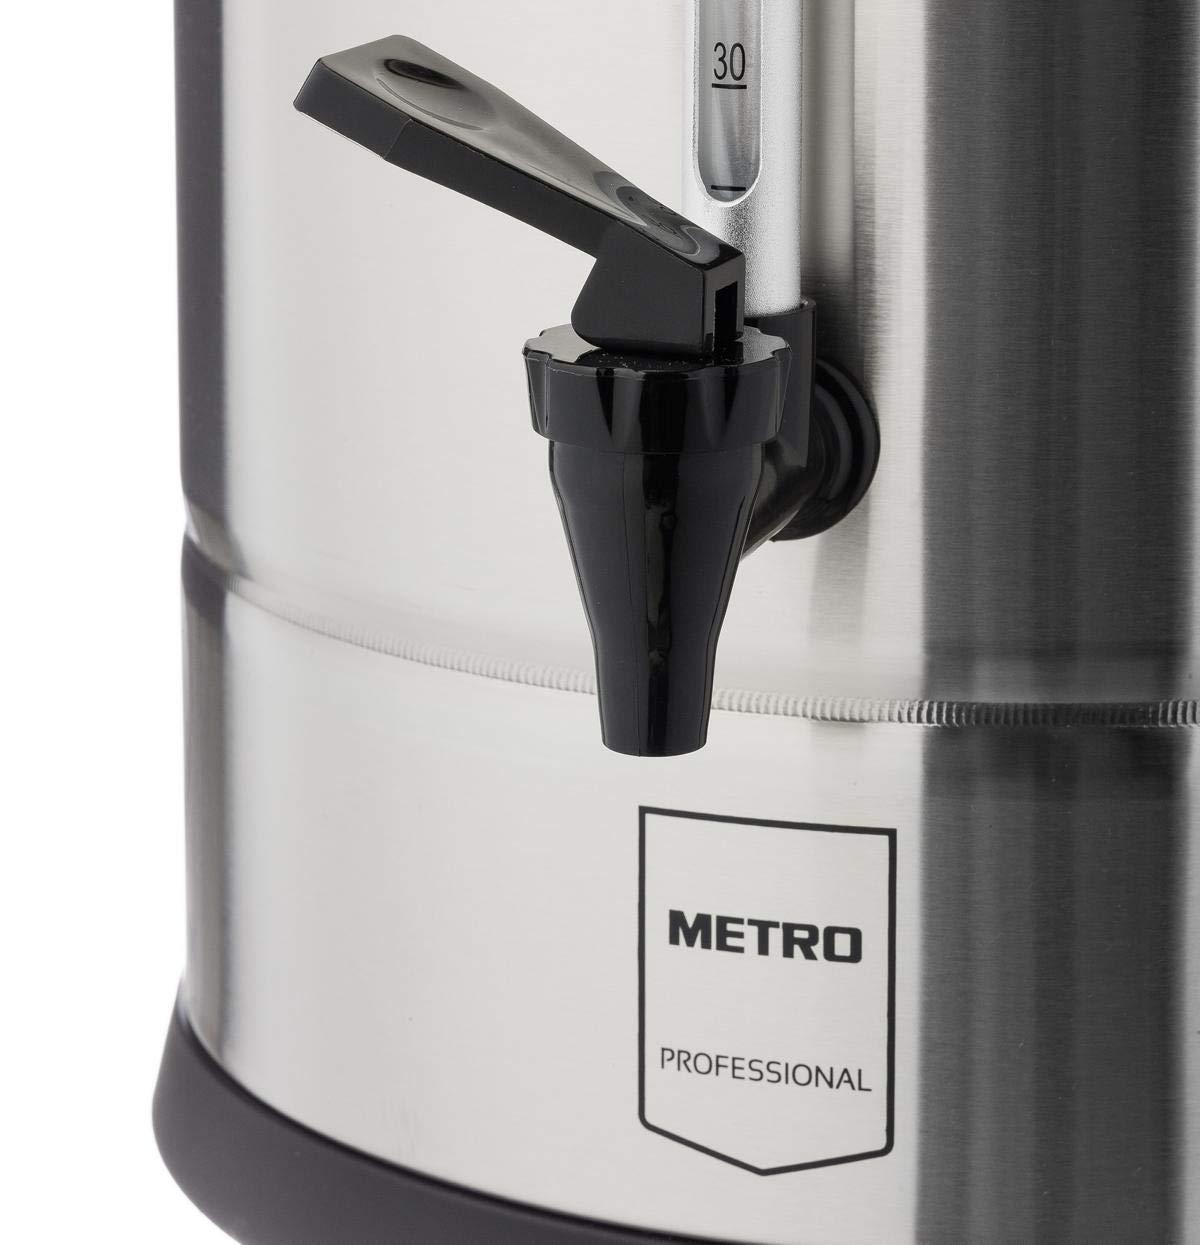 Metro Professional Kaffeemaschine GCM4015 100 Tassen 15 l